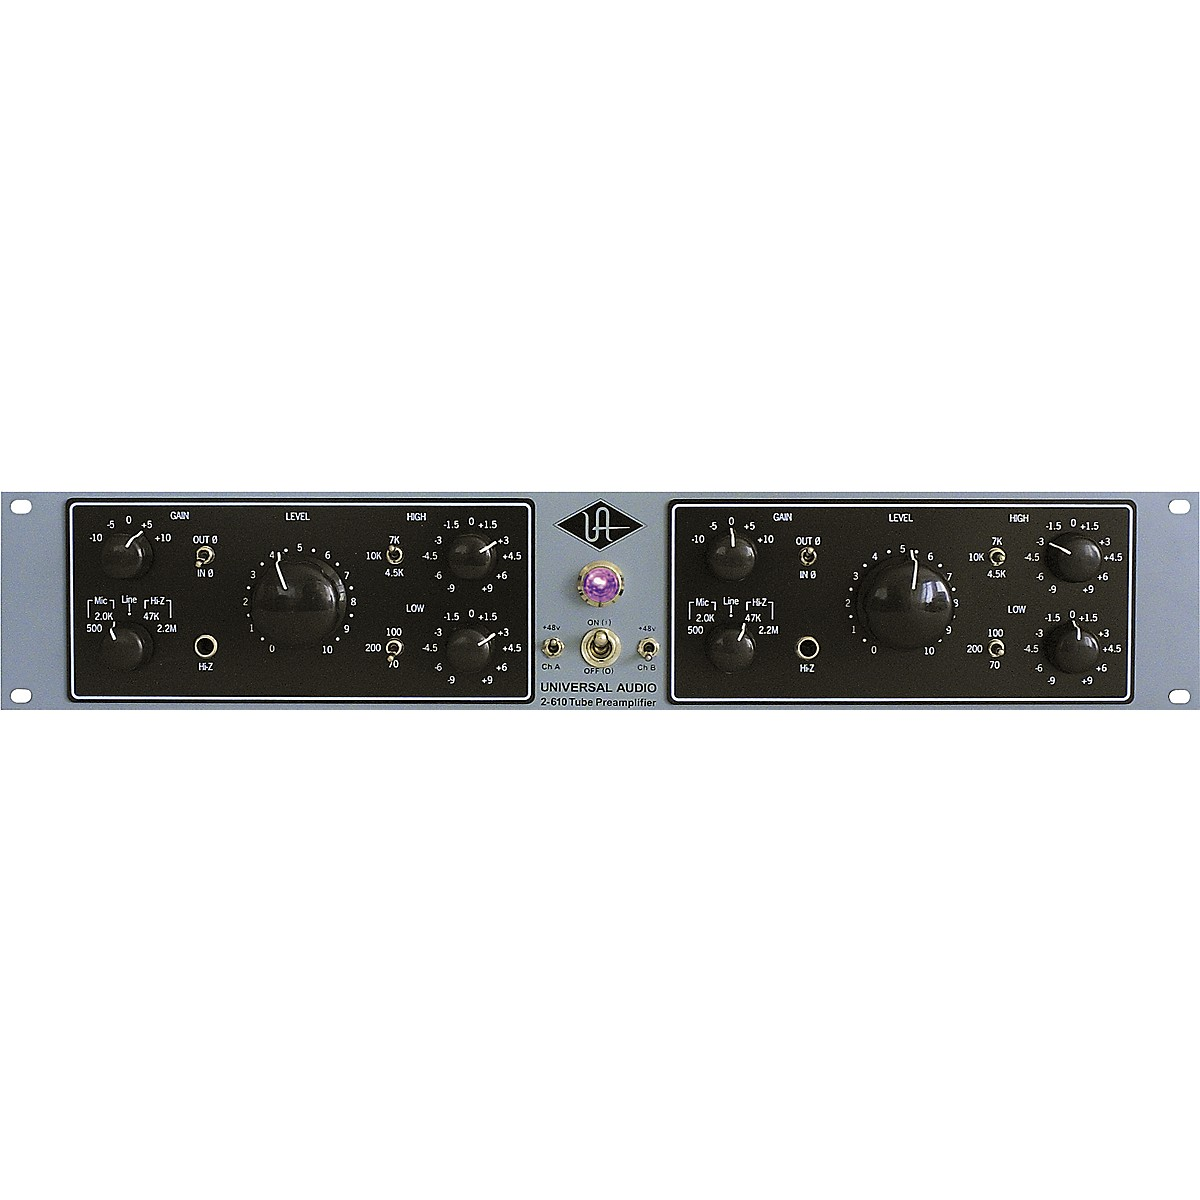 Universal Audio 2-610 Silverface Dual Channel Mic Pre